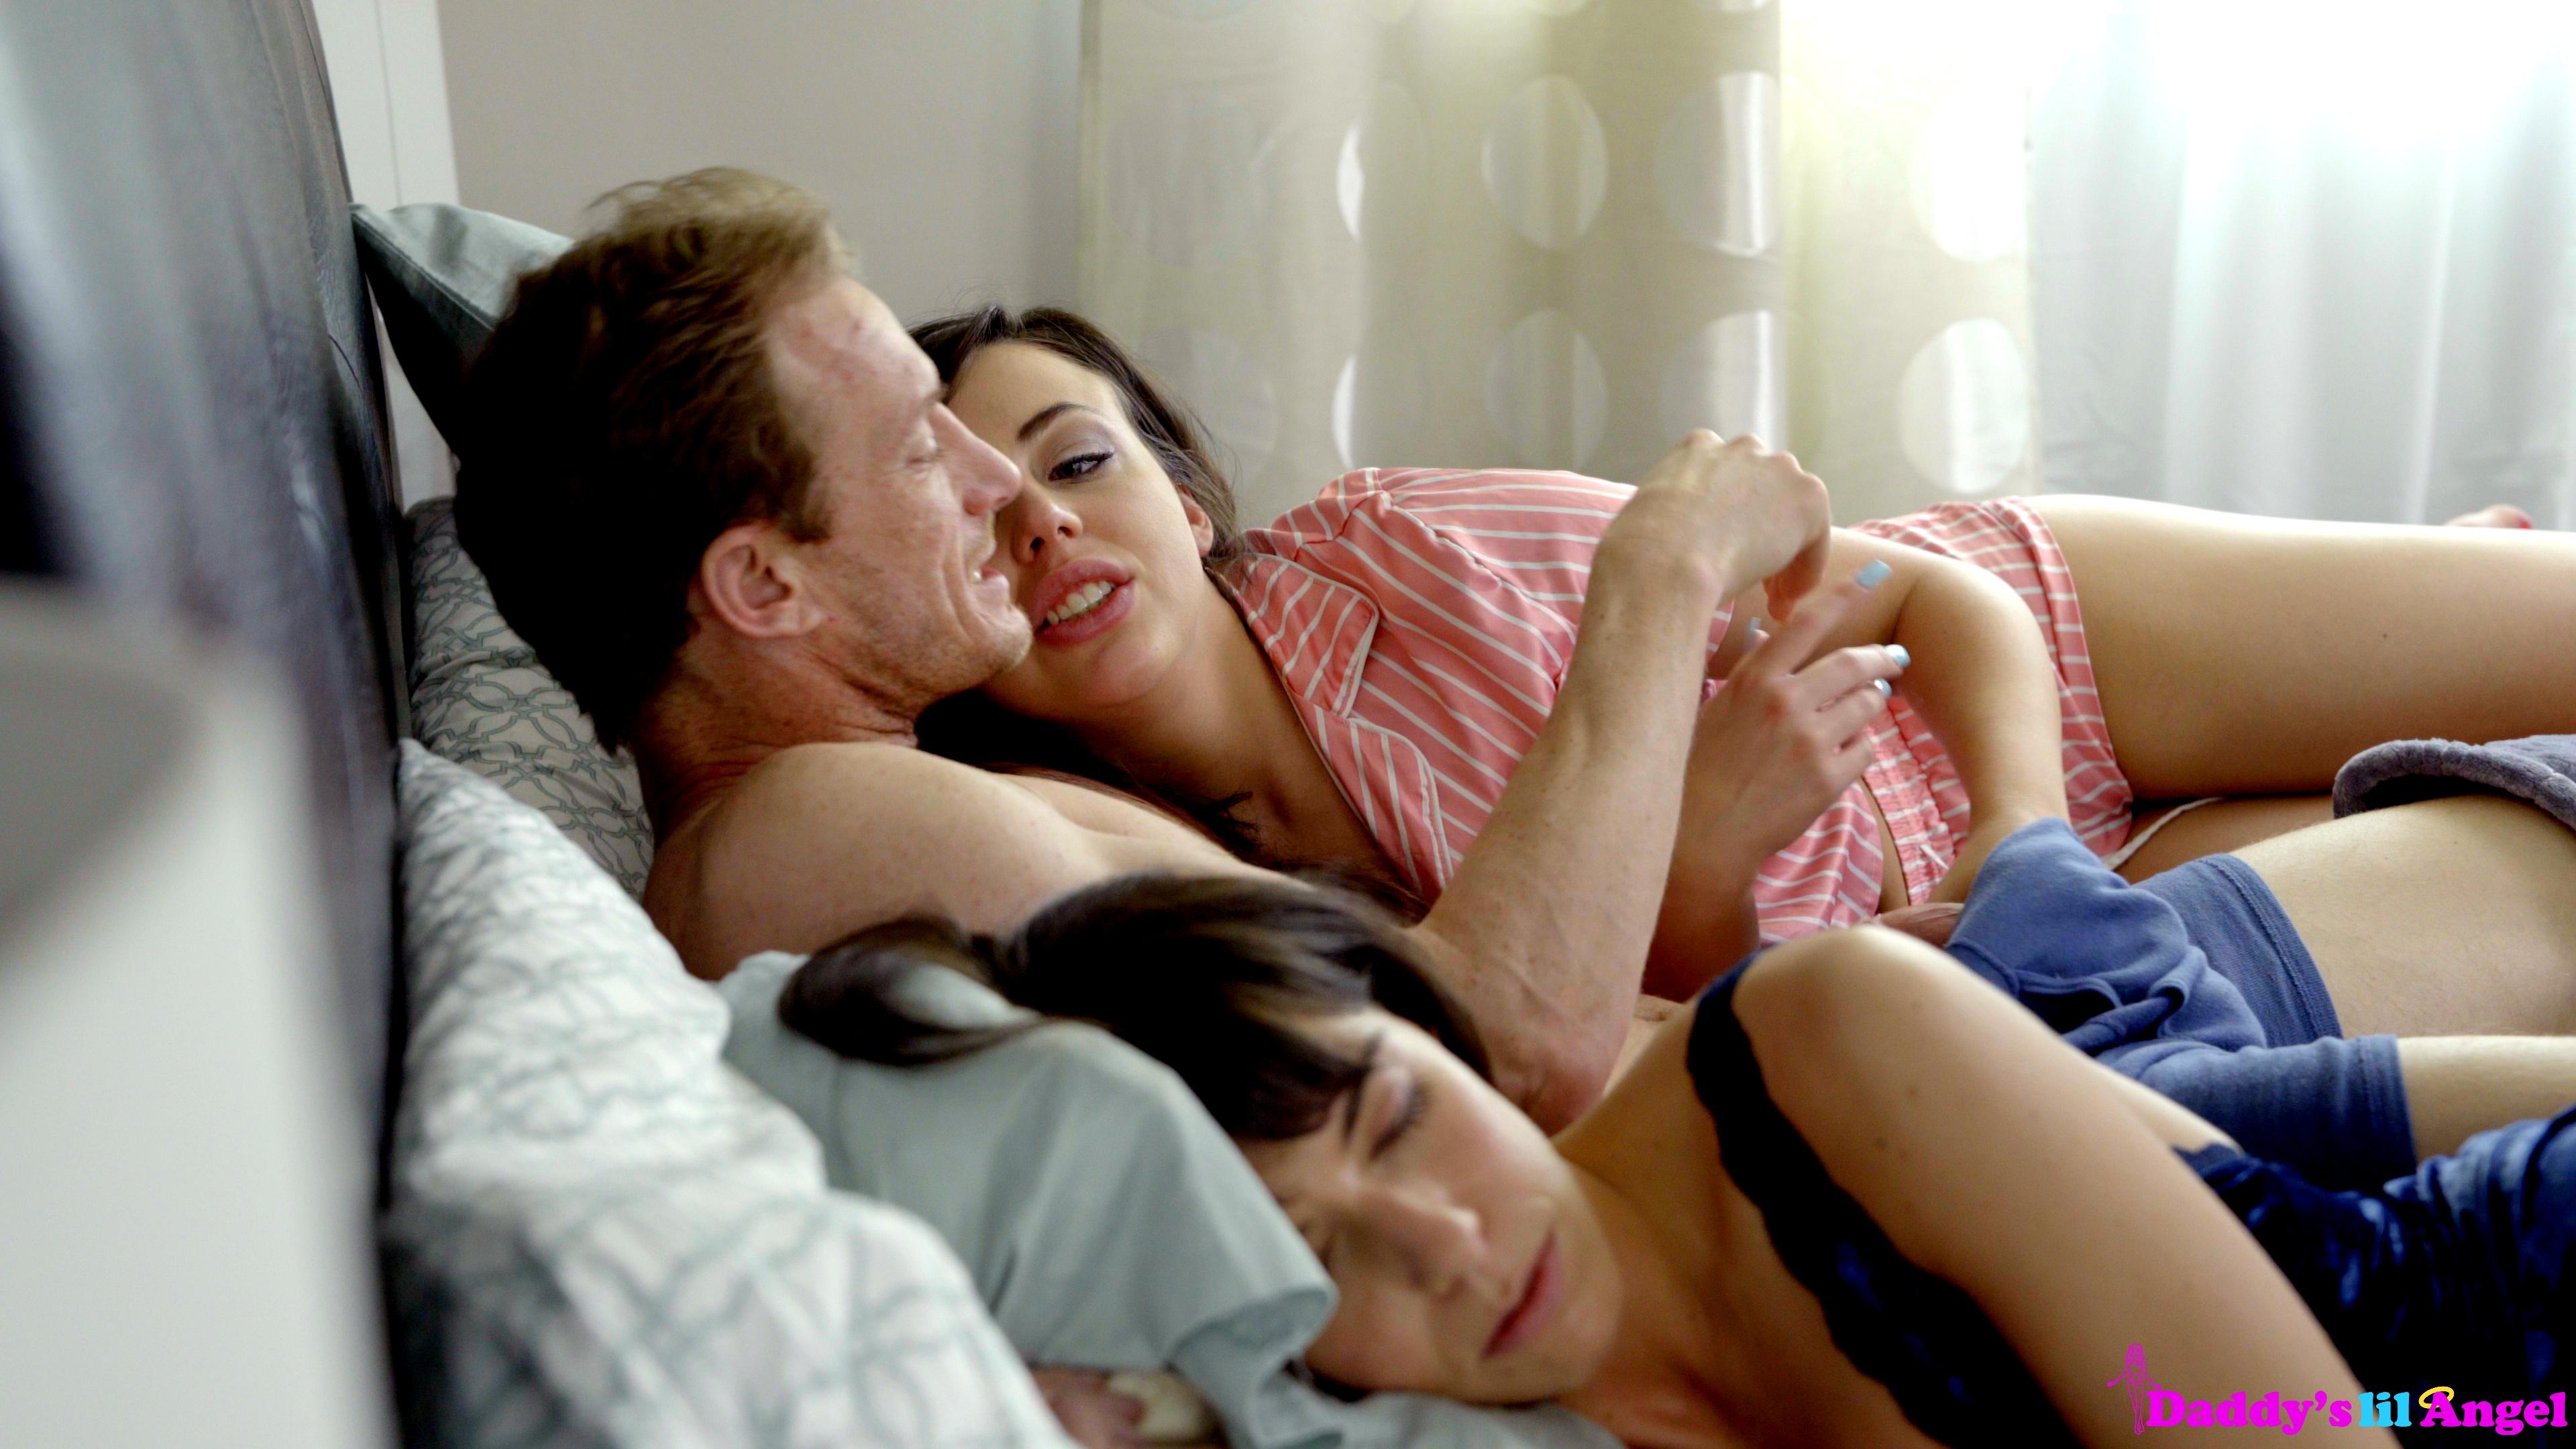 DaddysLilAngel.com - Whitney Wright: Dont Wake Mommy - S2:E4